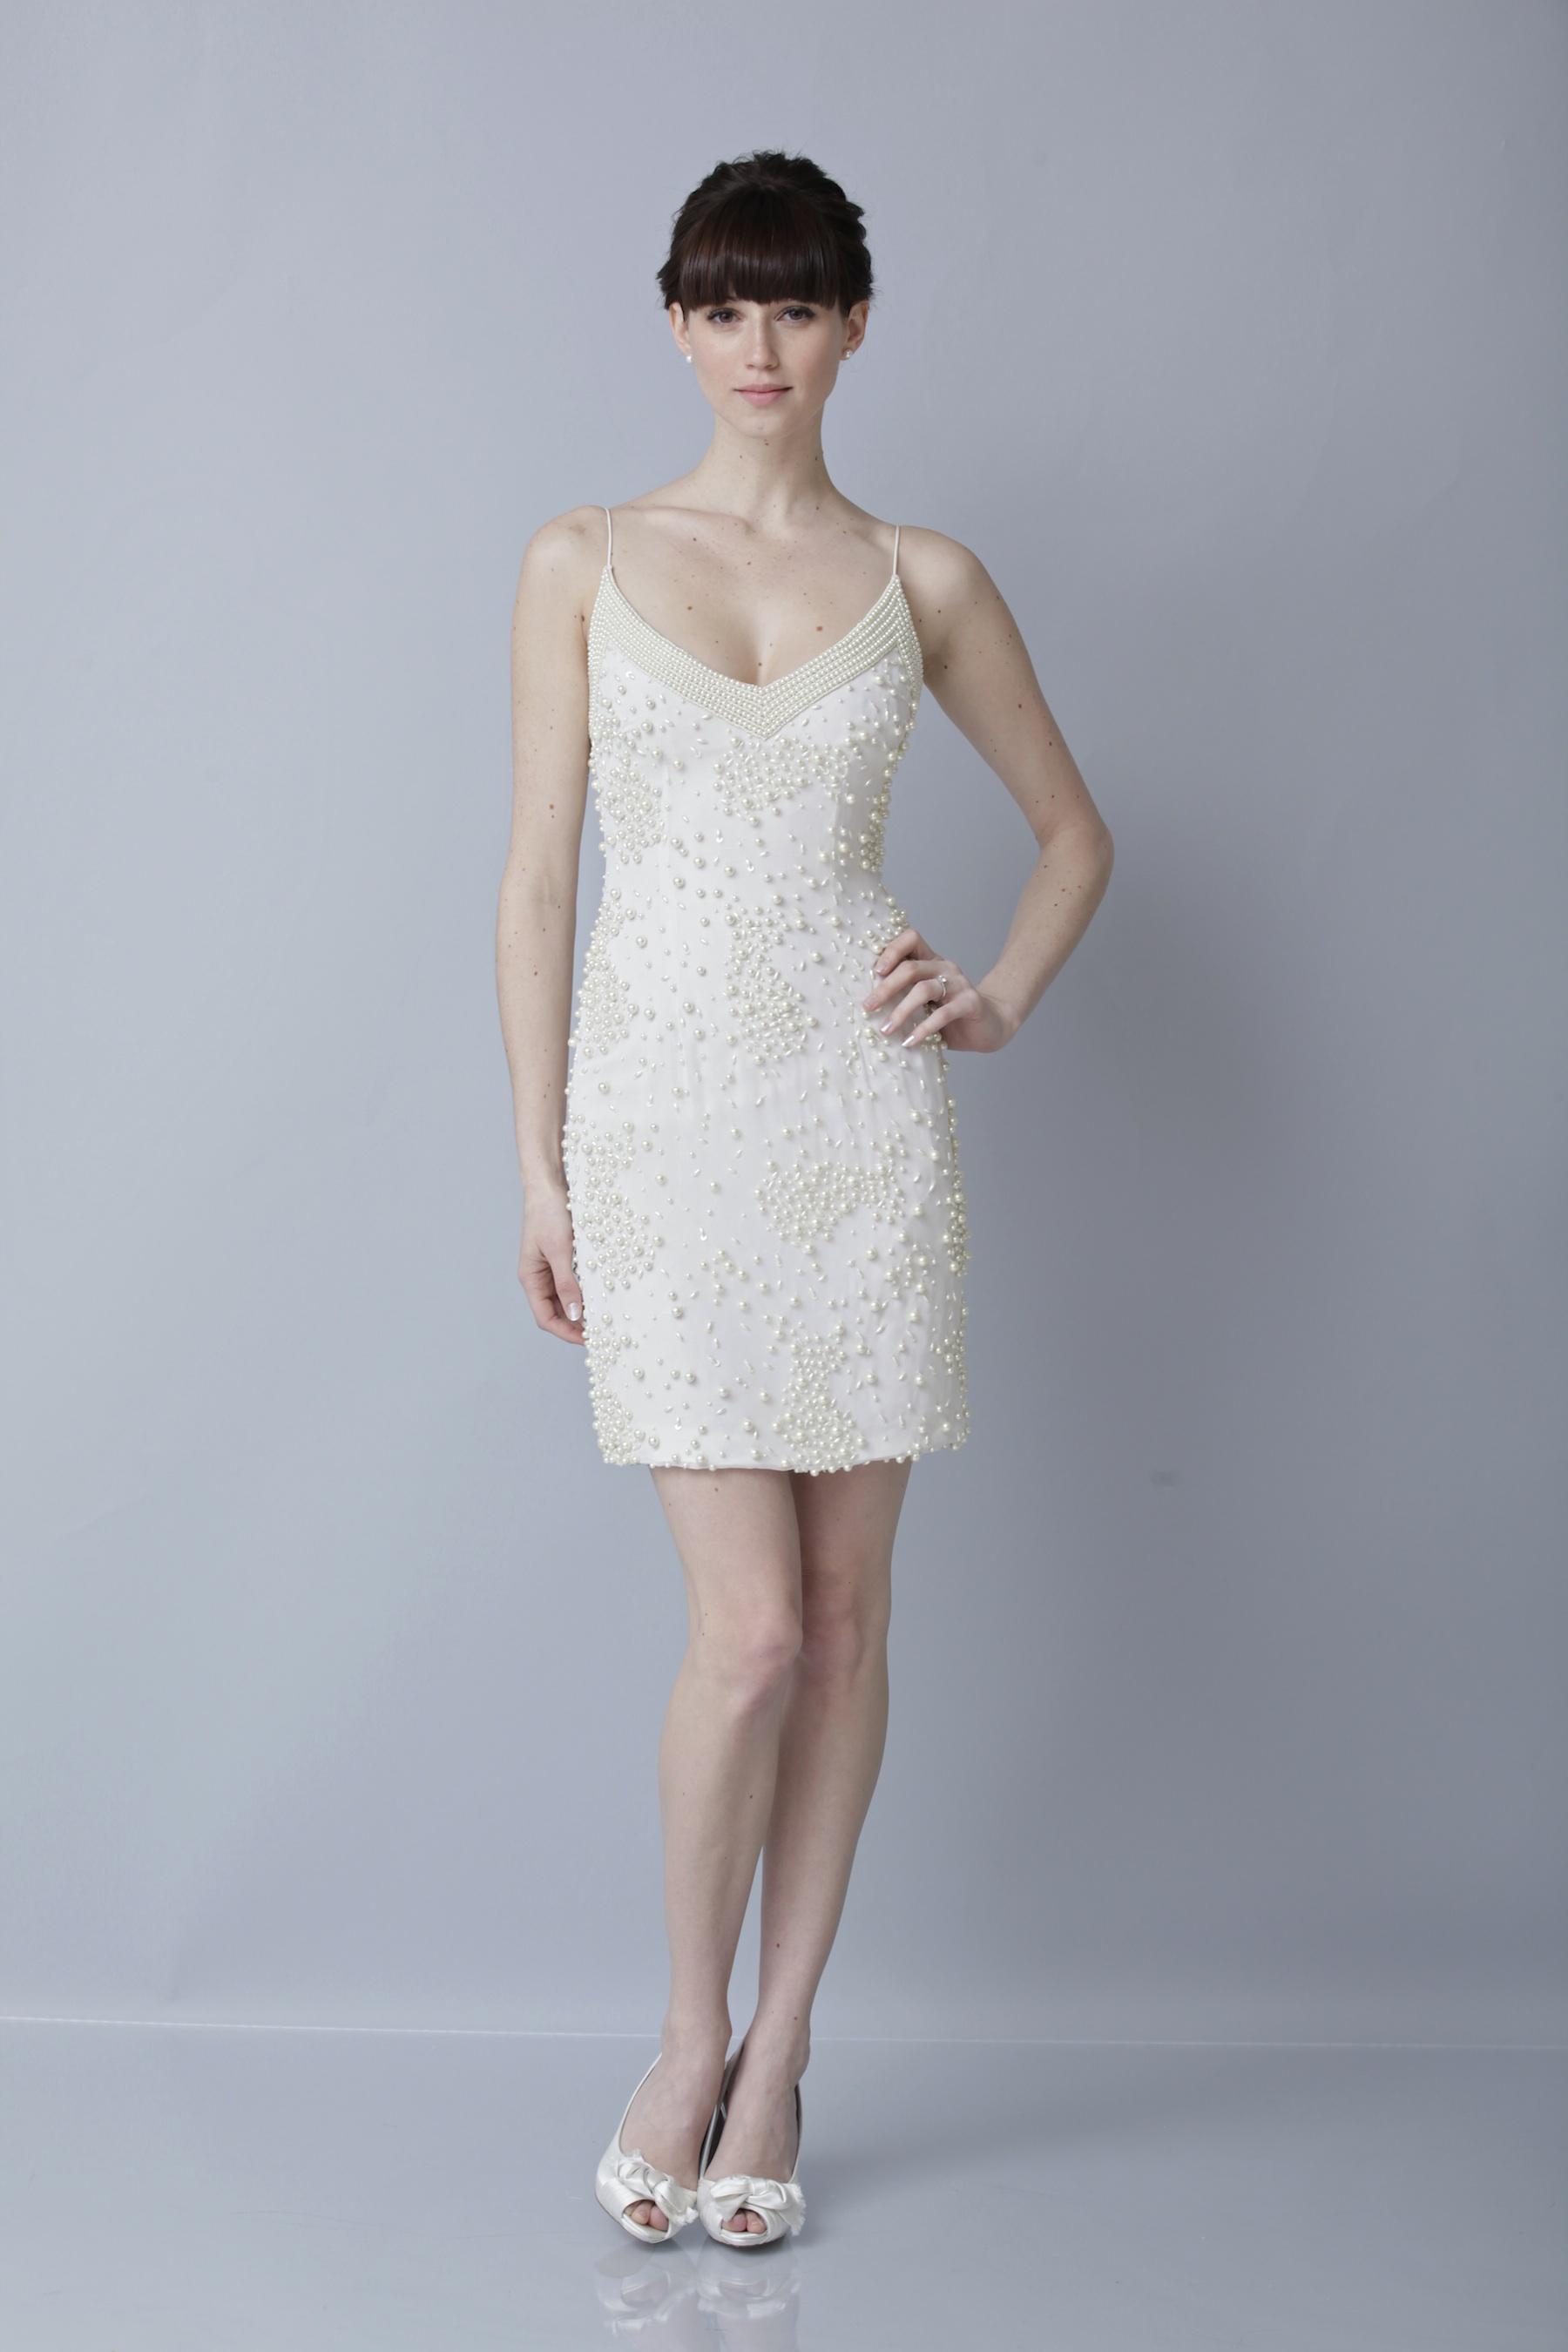 Best Of Wedding Dresses Rental Las Vegas Nv – Wedding